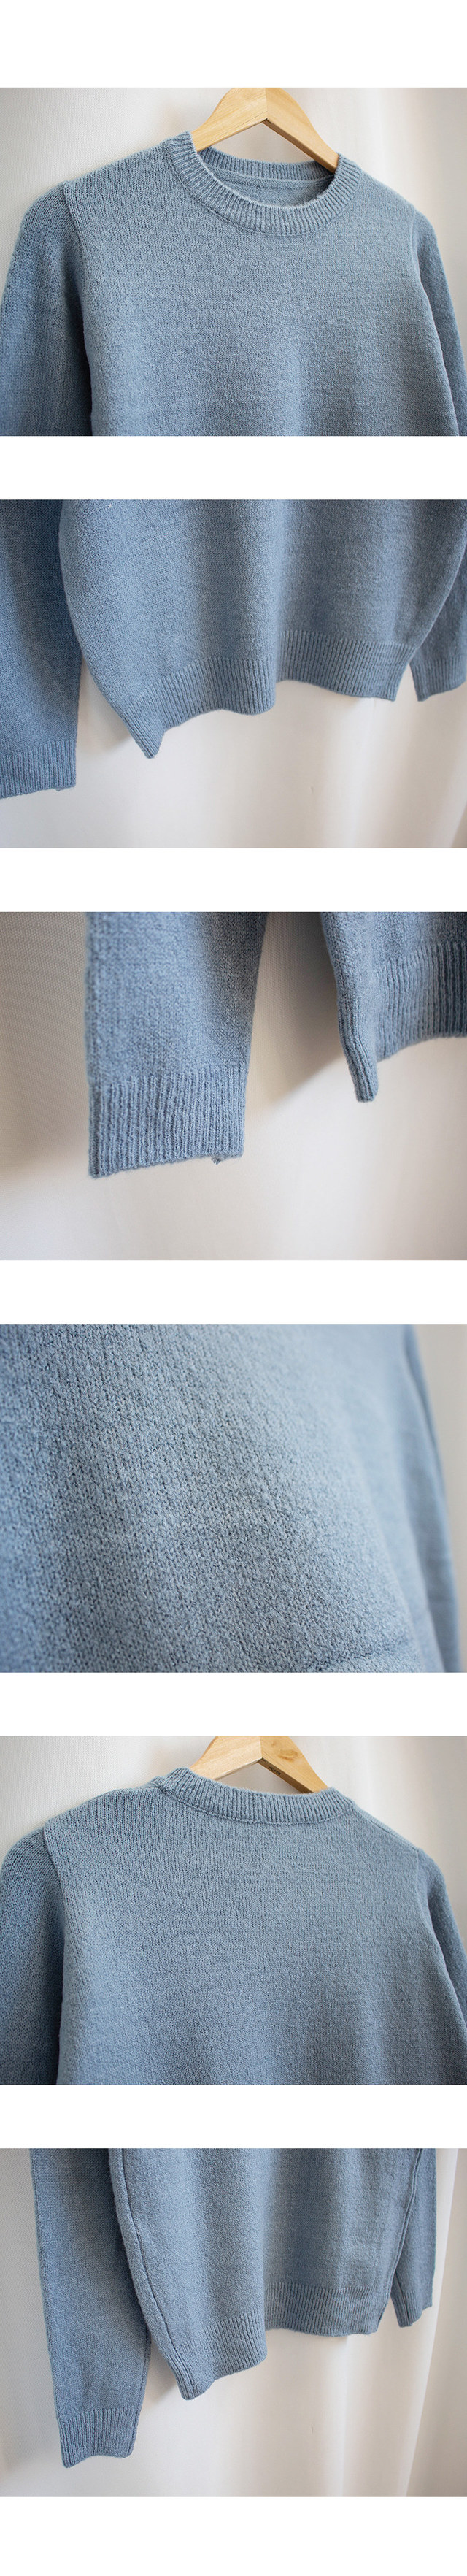 JU Den Ring Round Knit